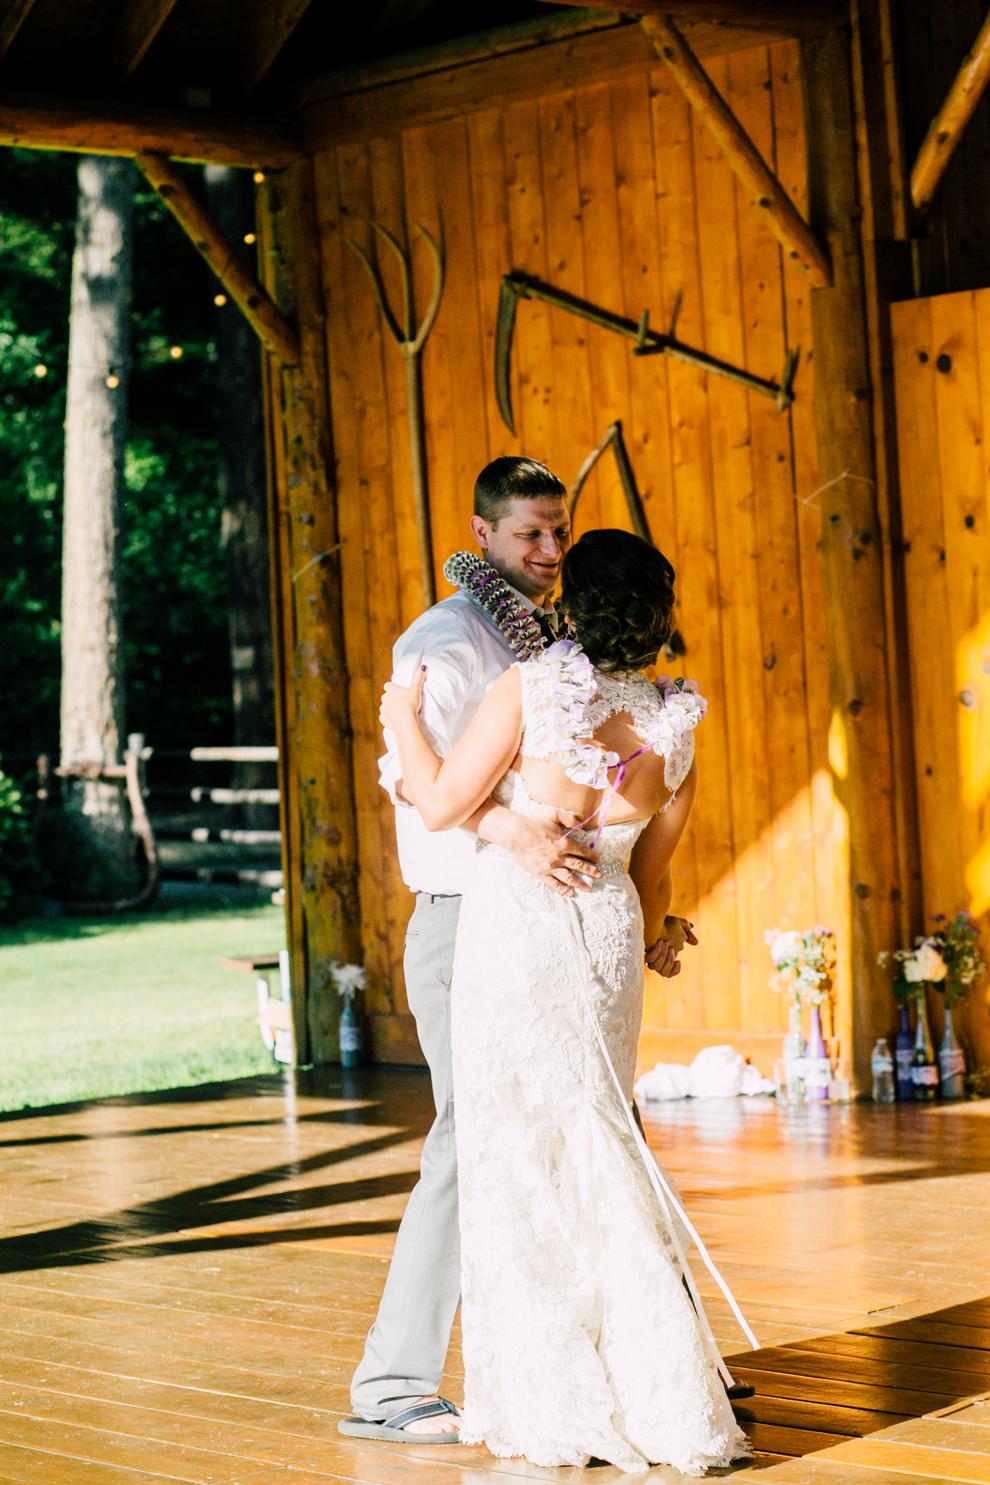 095-leavenworth-mountain-springs-lodge-wedding-karena-saul-katheryn-moran-photography.jpg